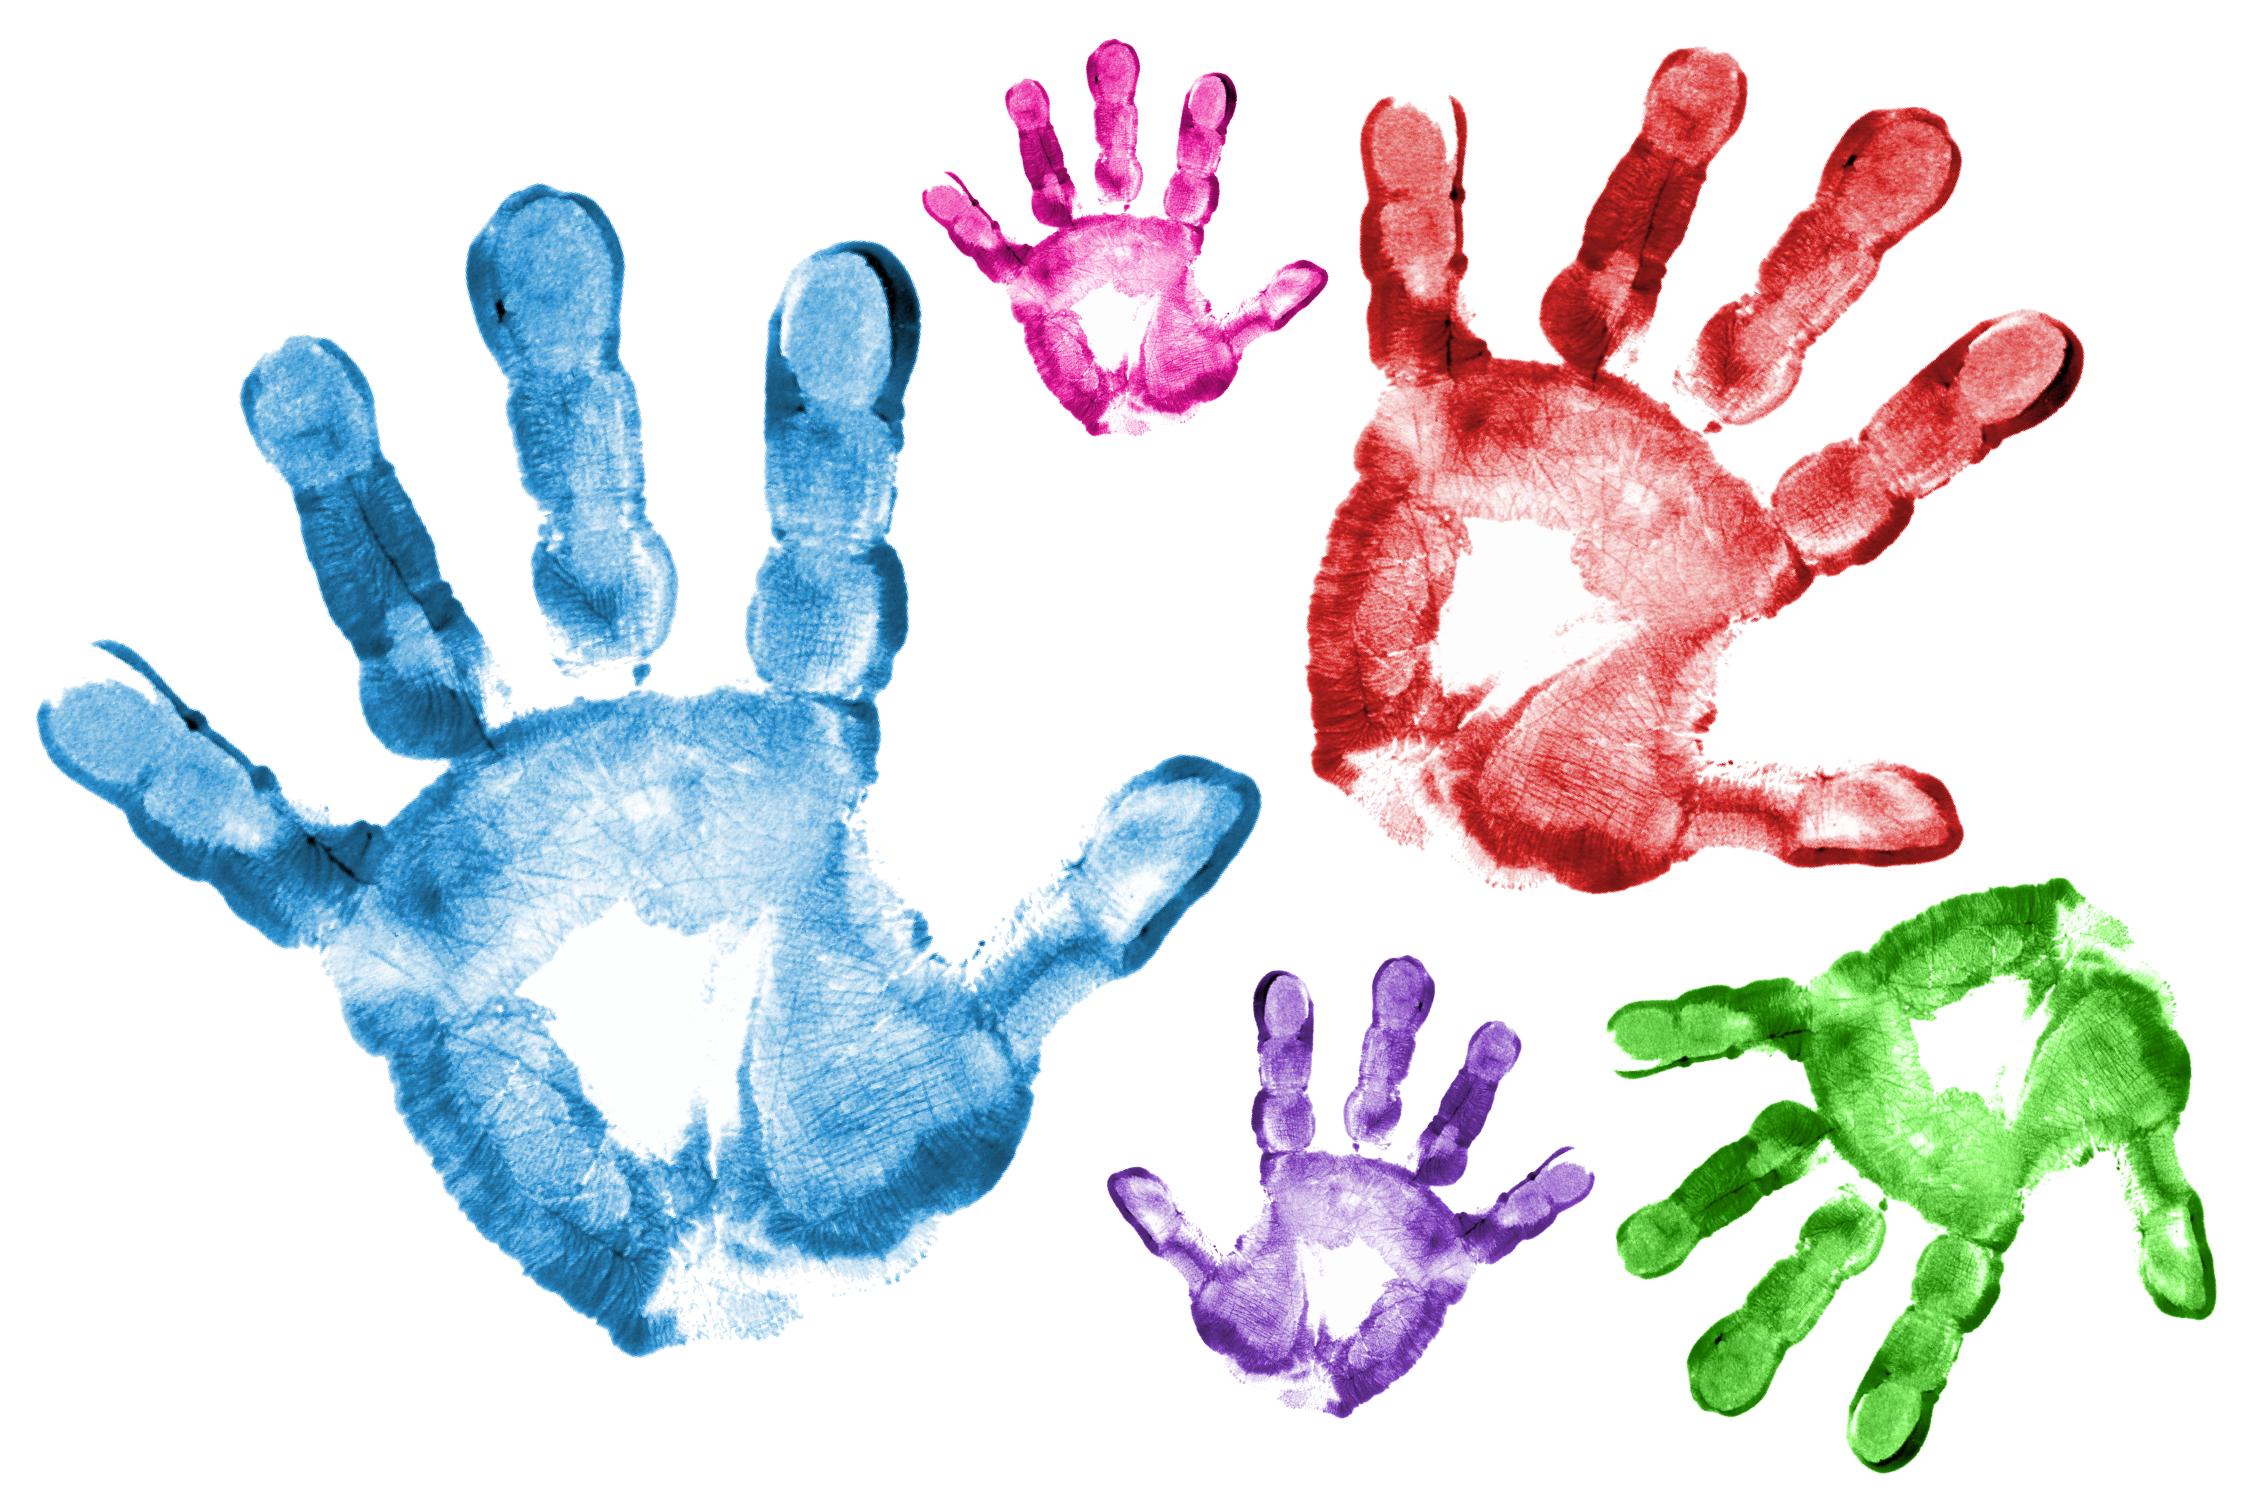 Young Child S Handprint Google Search Childs Handprint Children Hand Print